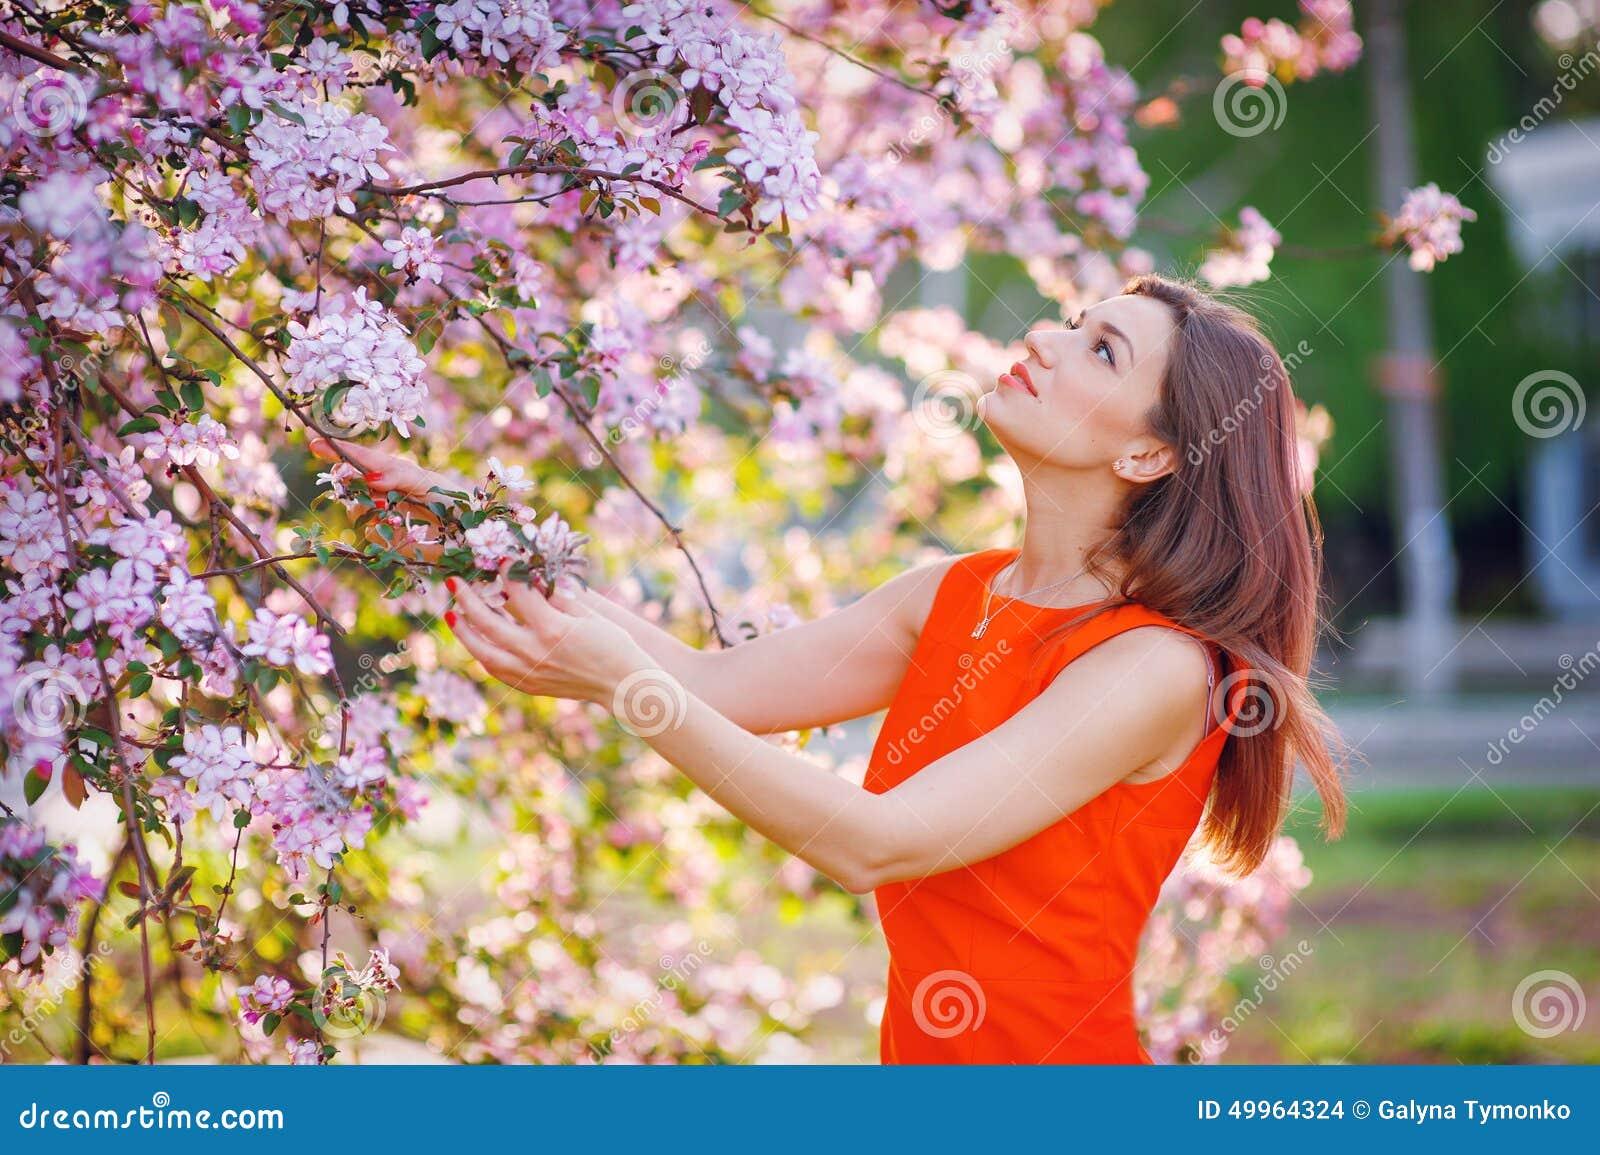 Картинки t пахнет весной